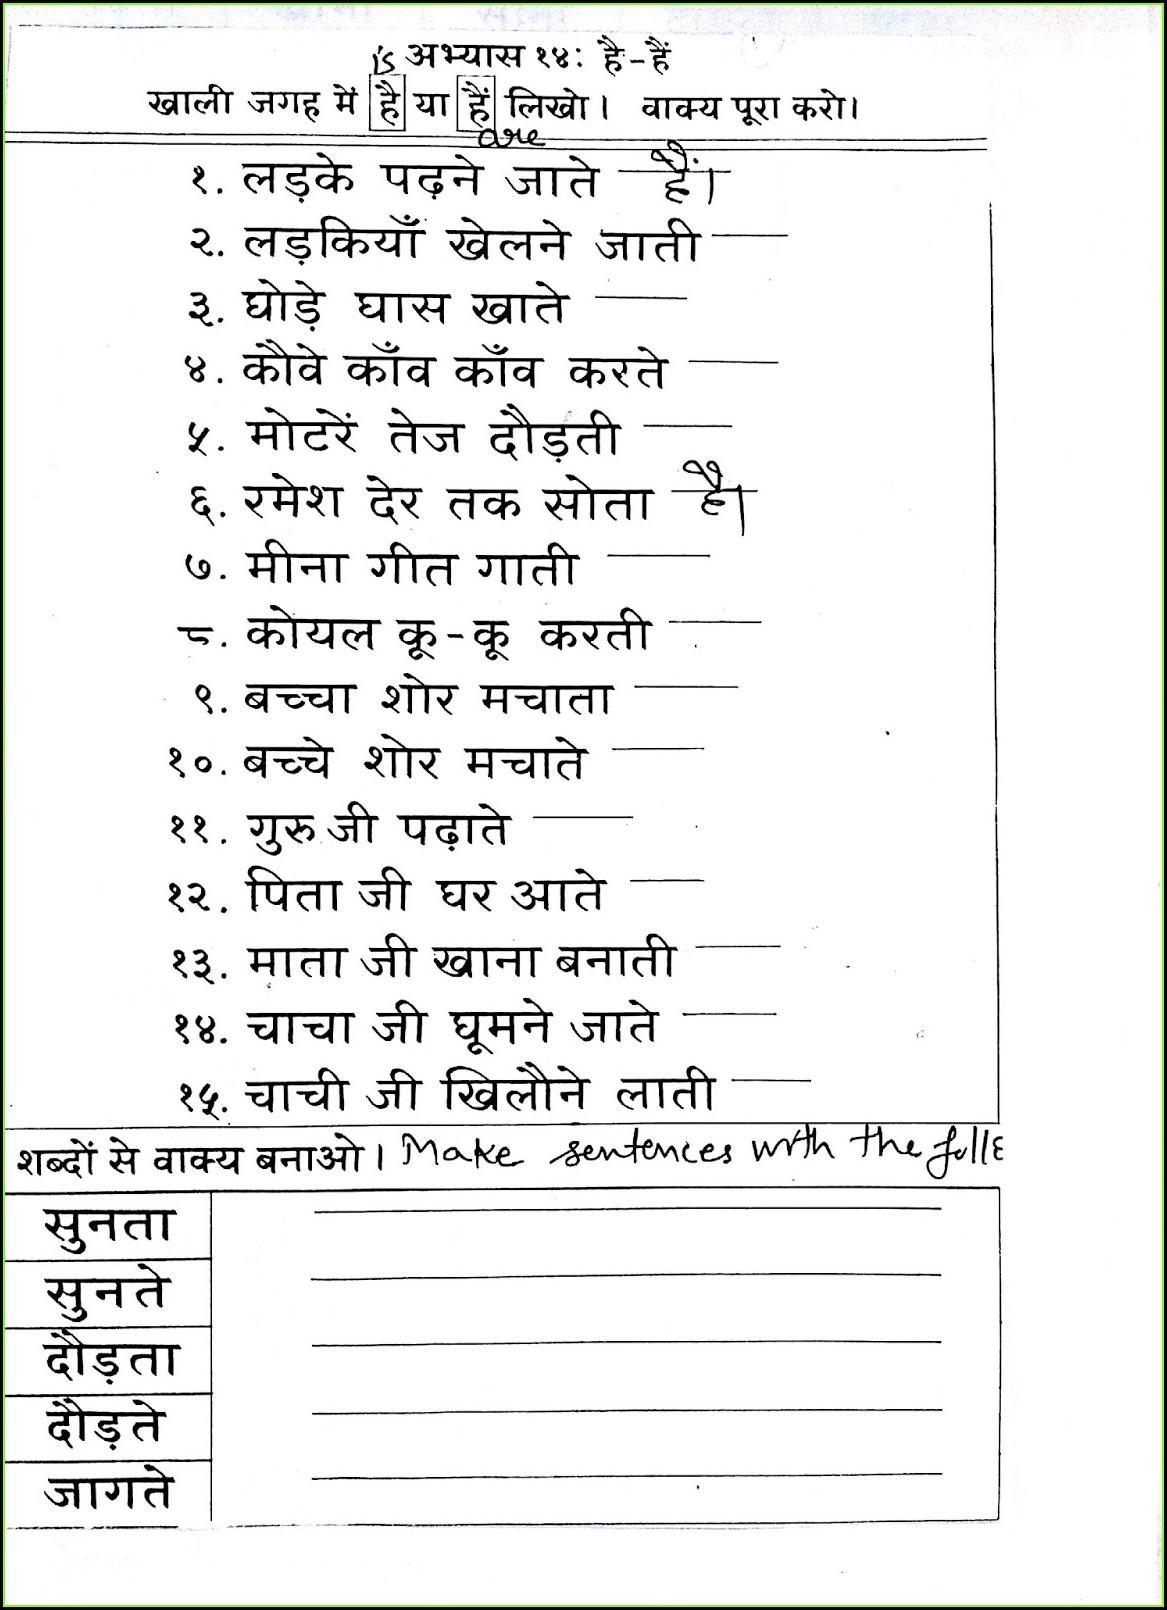 Hindi Ling Badlo Worksheet For Class 5 Worksheet Resume